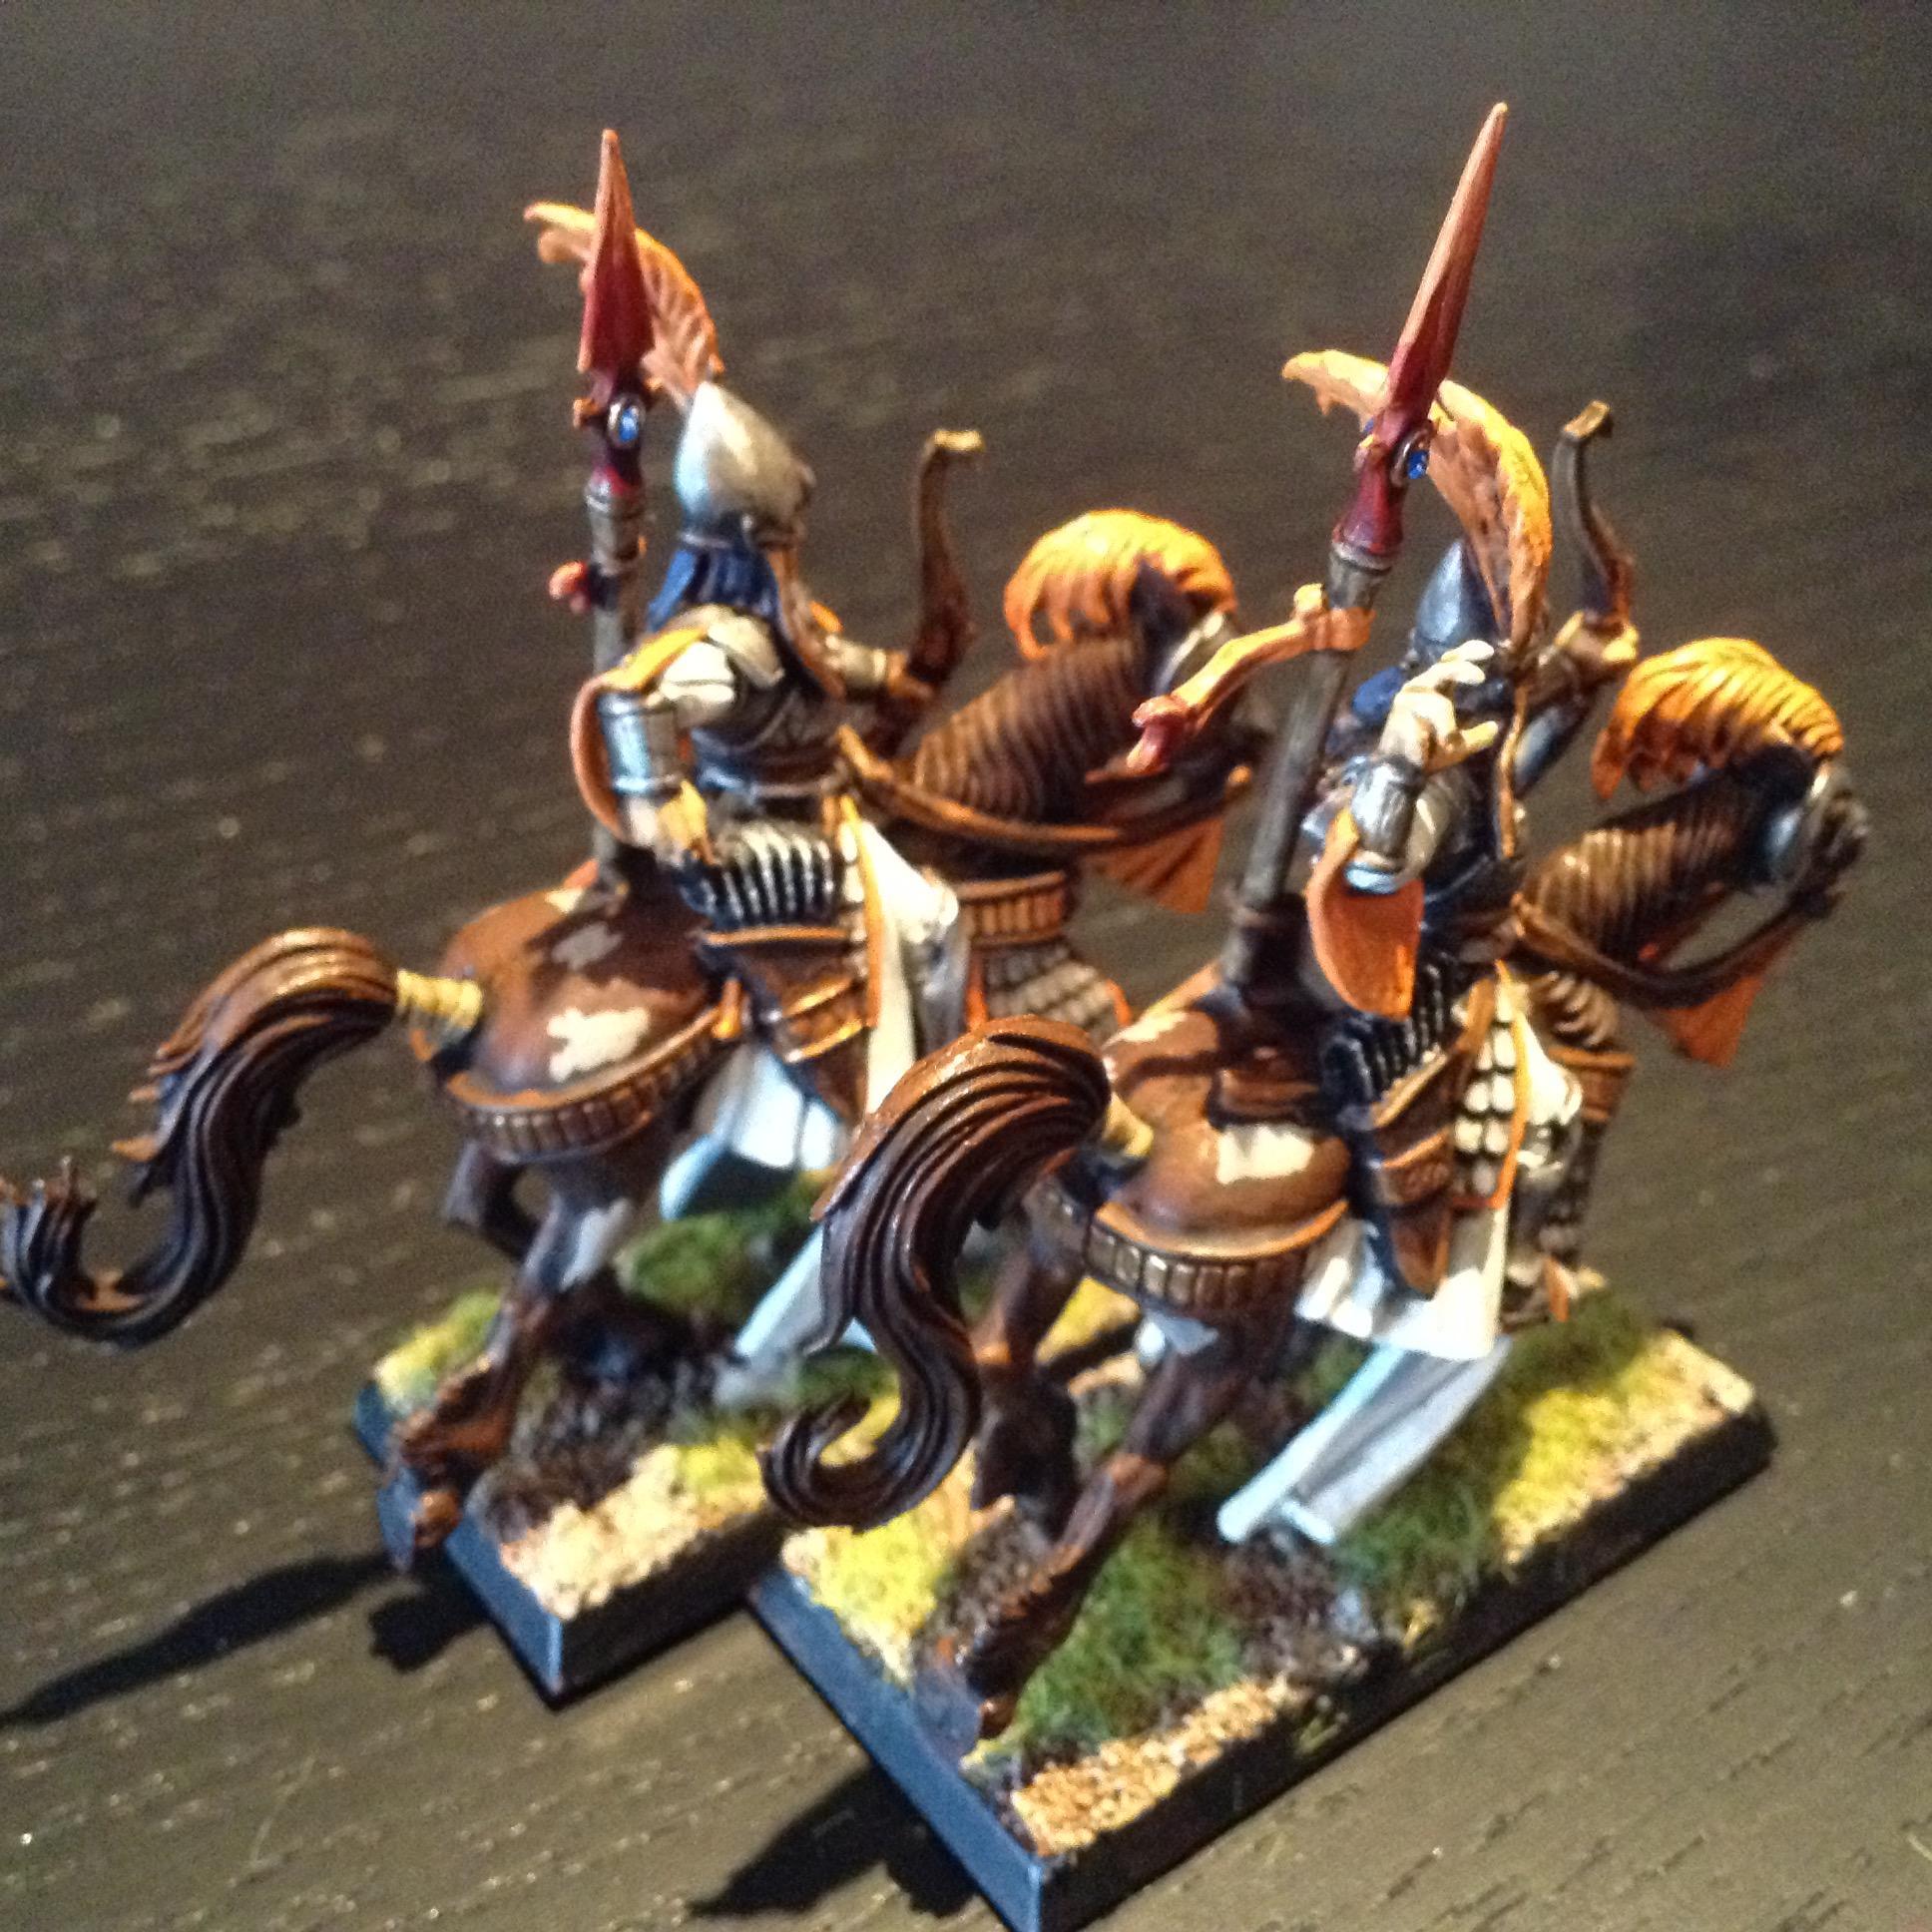 Ellyrian, High Elves, Orange, Reavers, Warhammer Fantasy